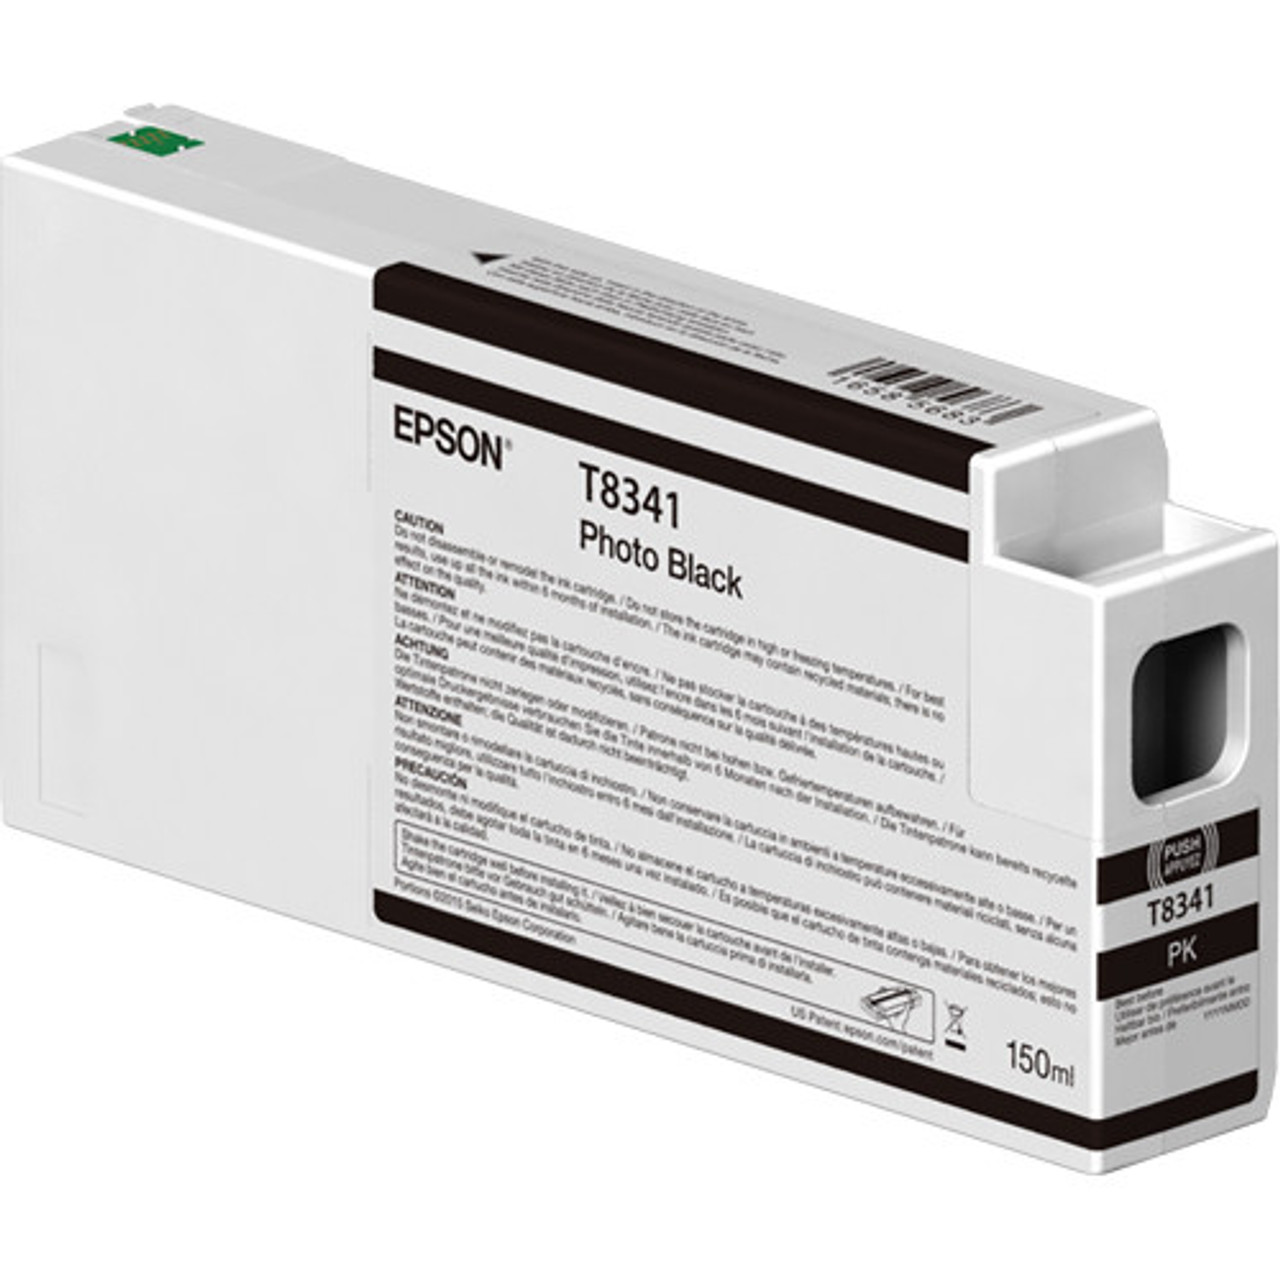 Epson T834100 UltraChrome HD Photo Black Ink Cartridge (150ml)